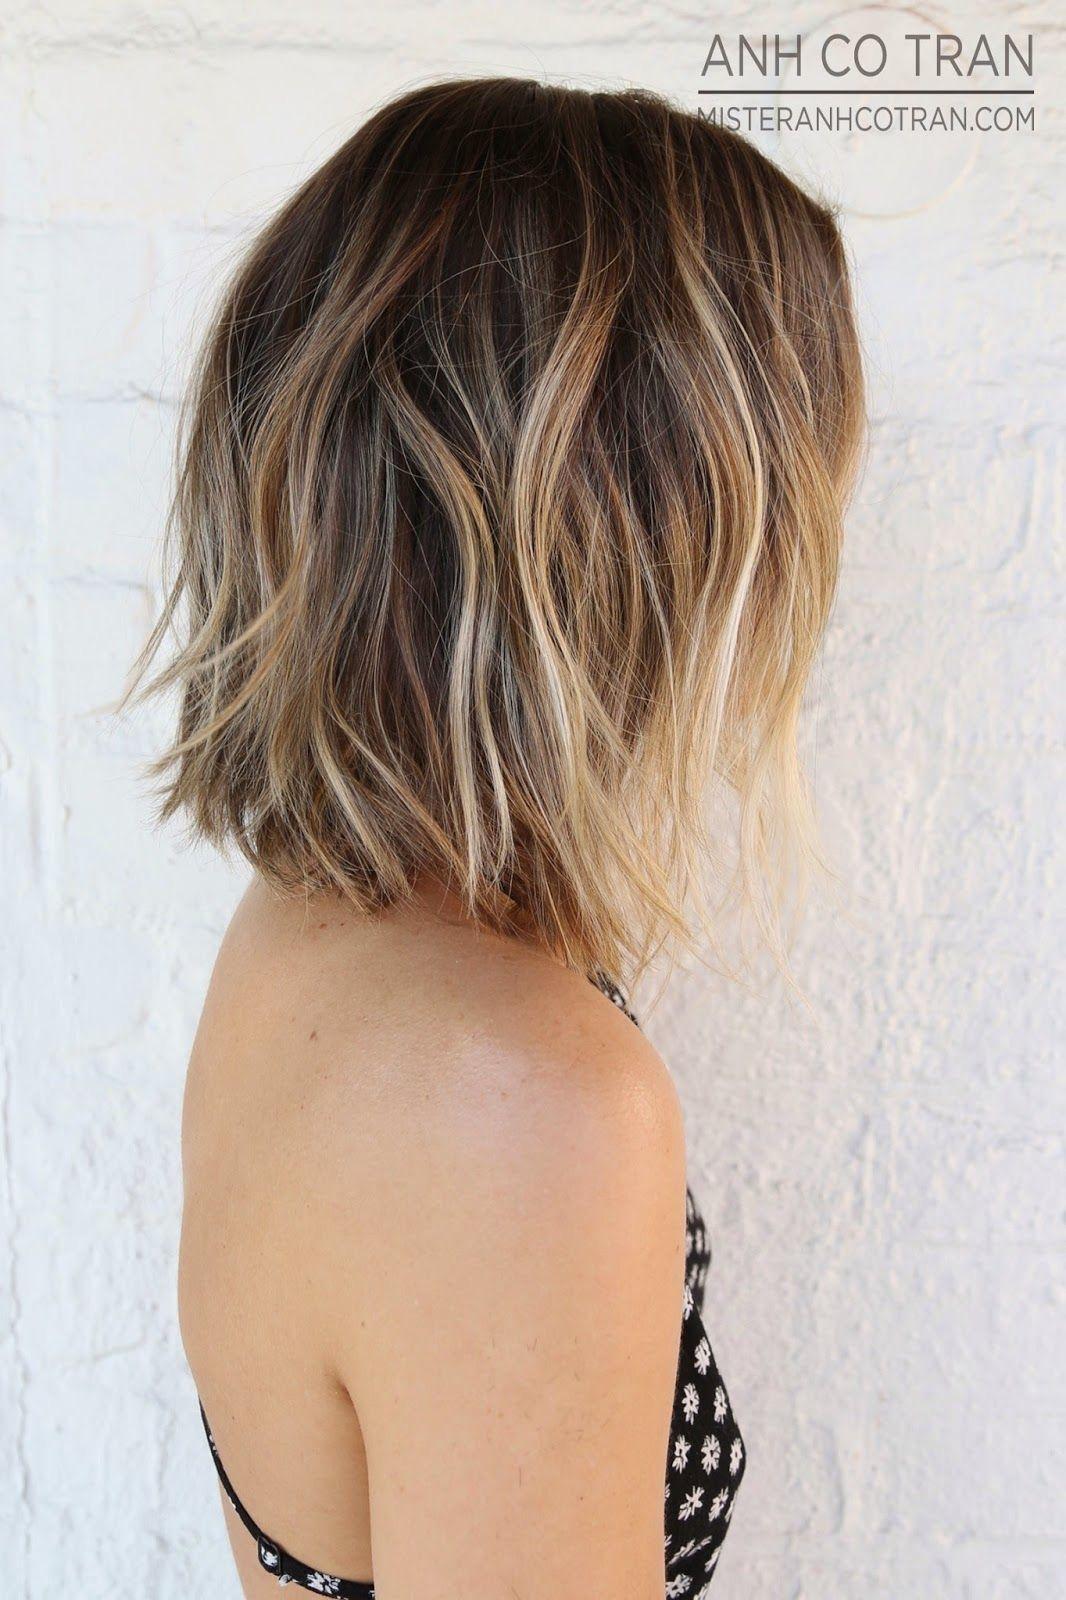 Pin By Georgia On Hair Hair Styles Ombre Hair Blonde Short Hair Styles